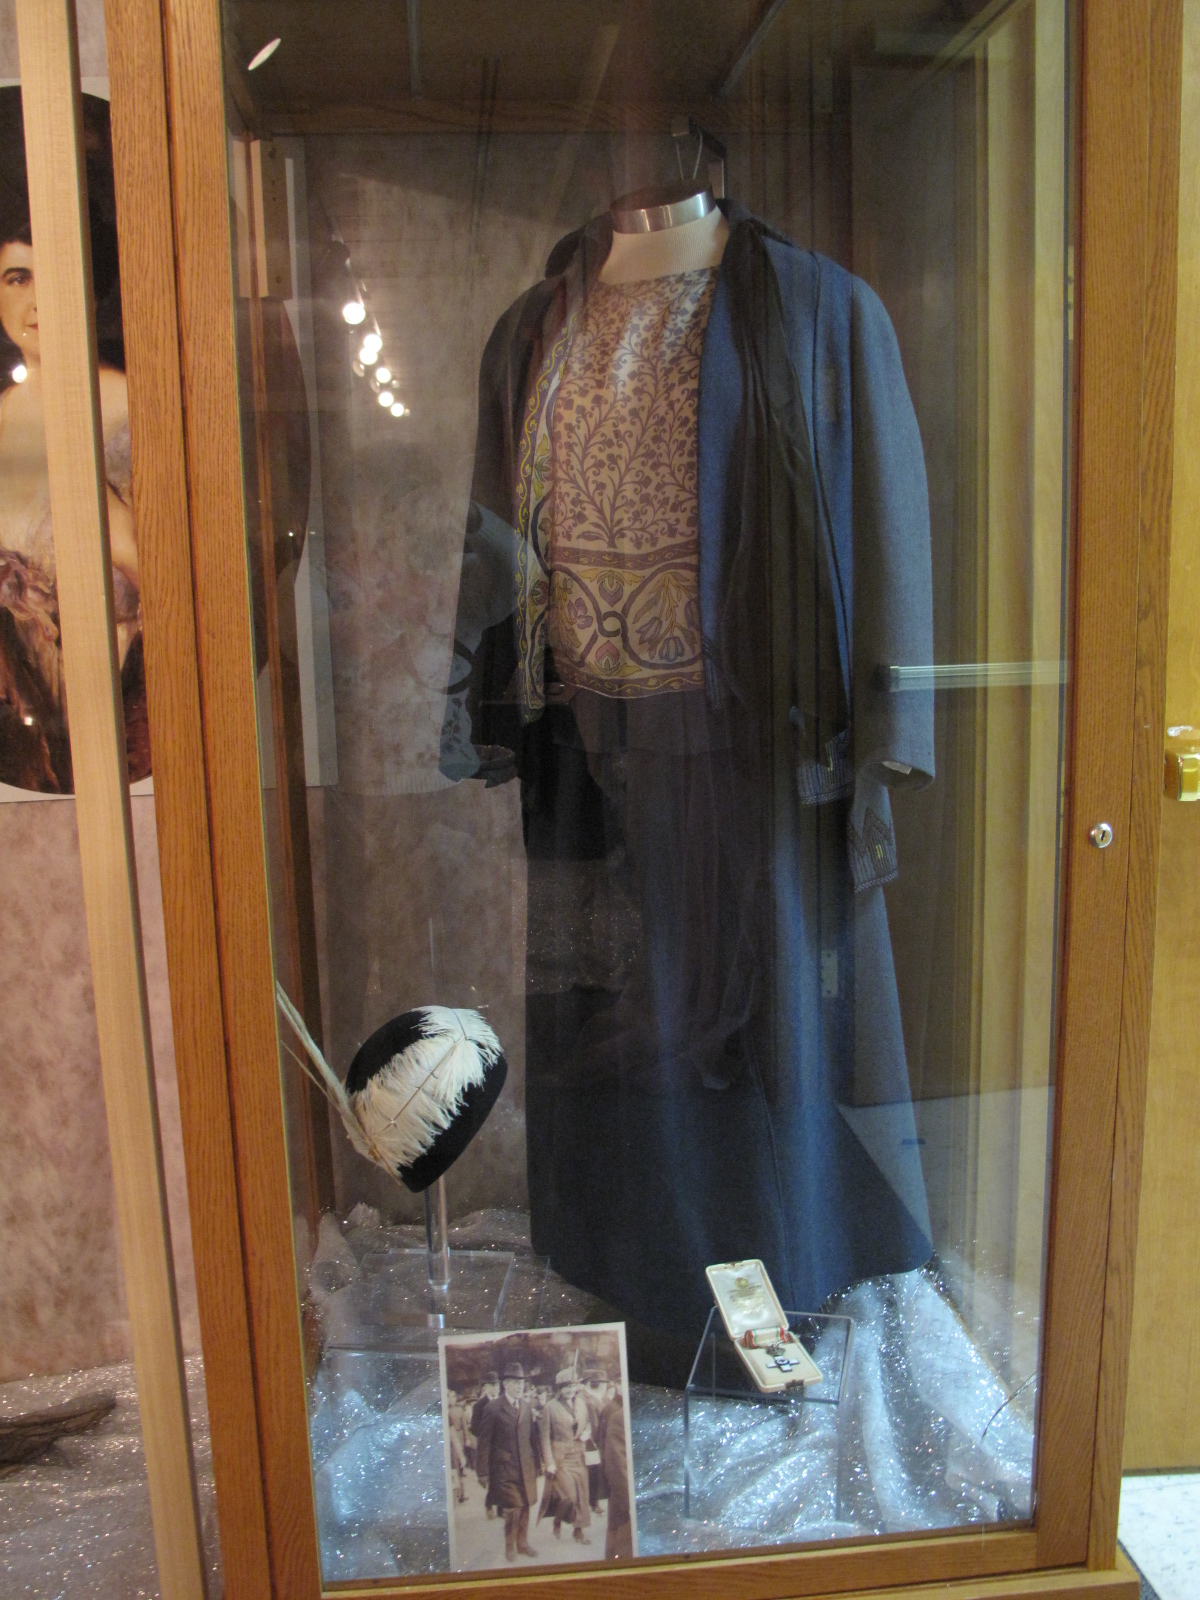 Photograph of Edith Galt Wilson's Worth Suit